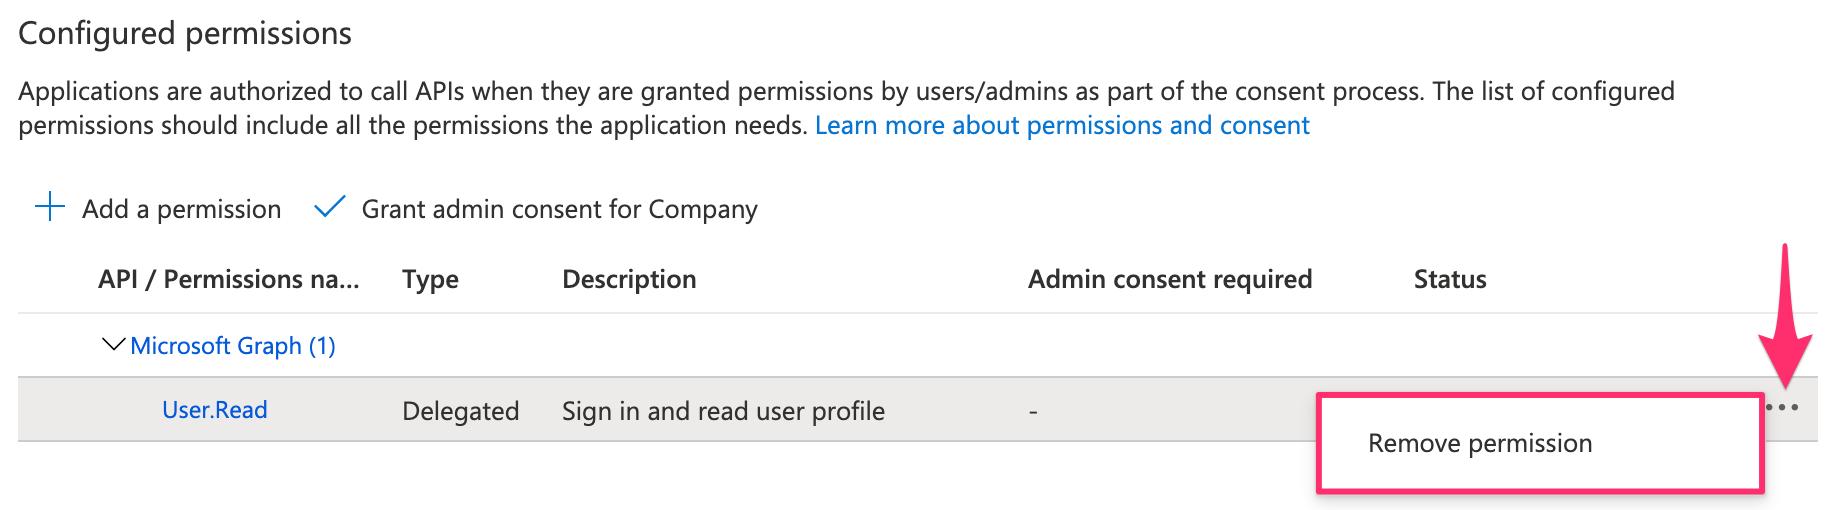 IT_Glue_Integration_2020_-_Azure_Active_Directory_admin_center77.png